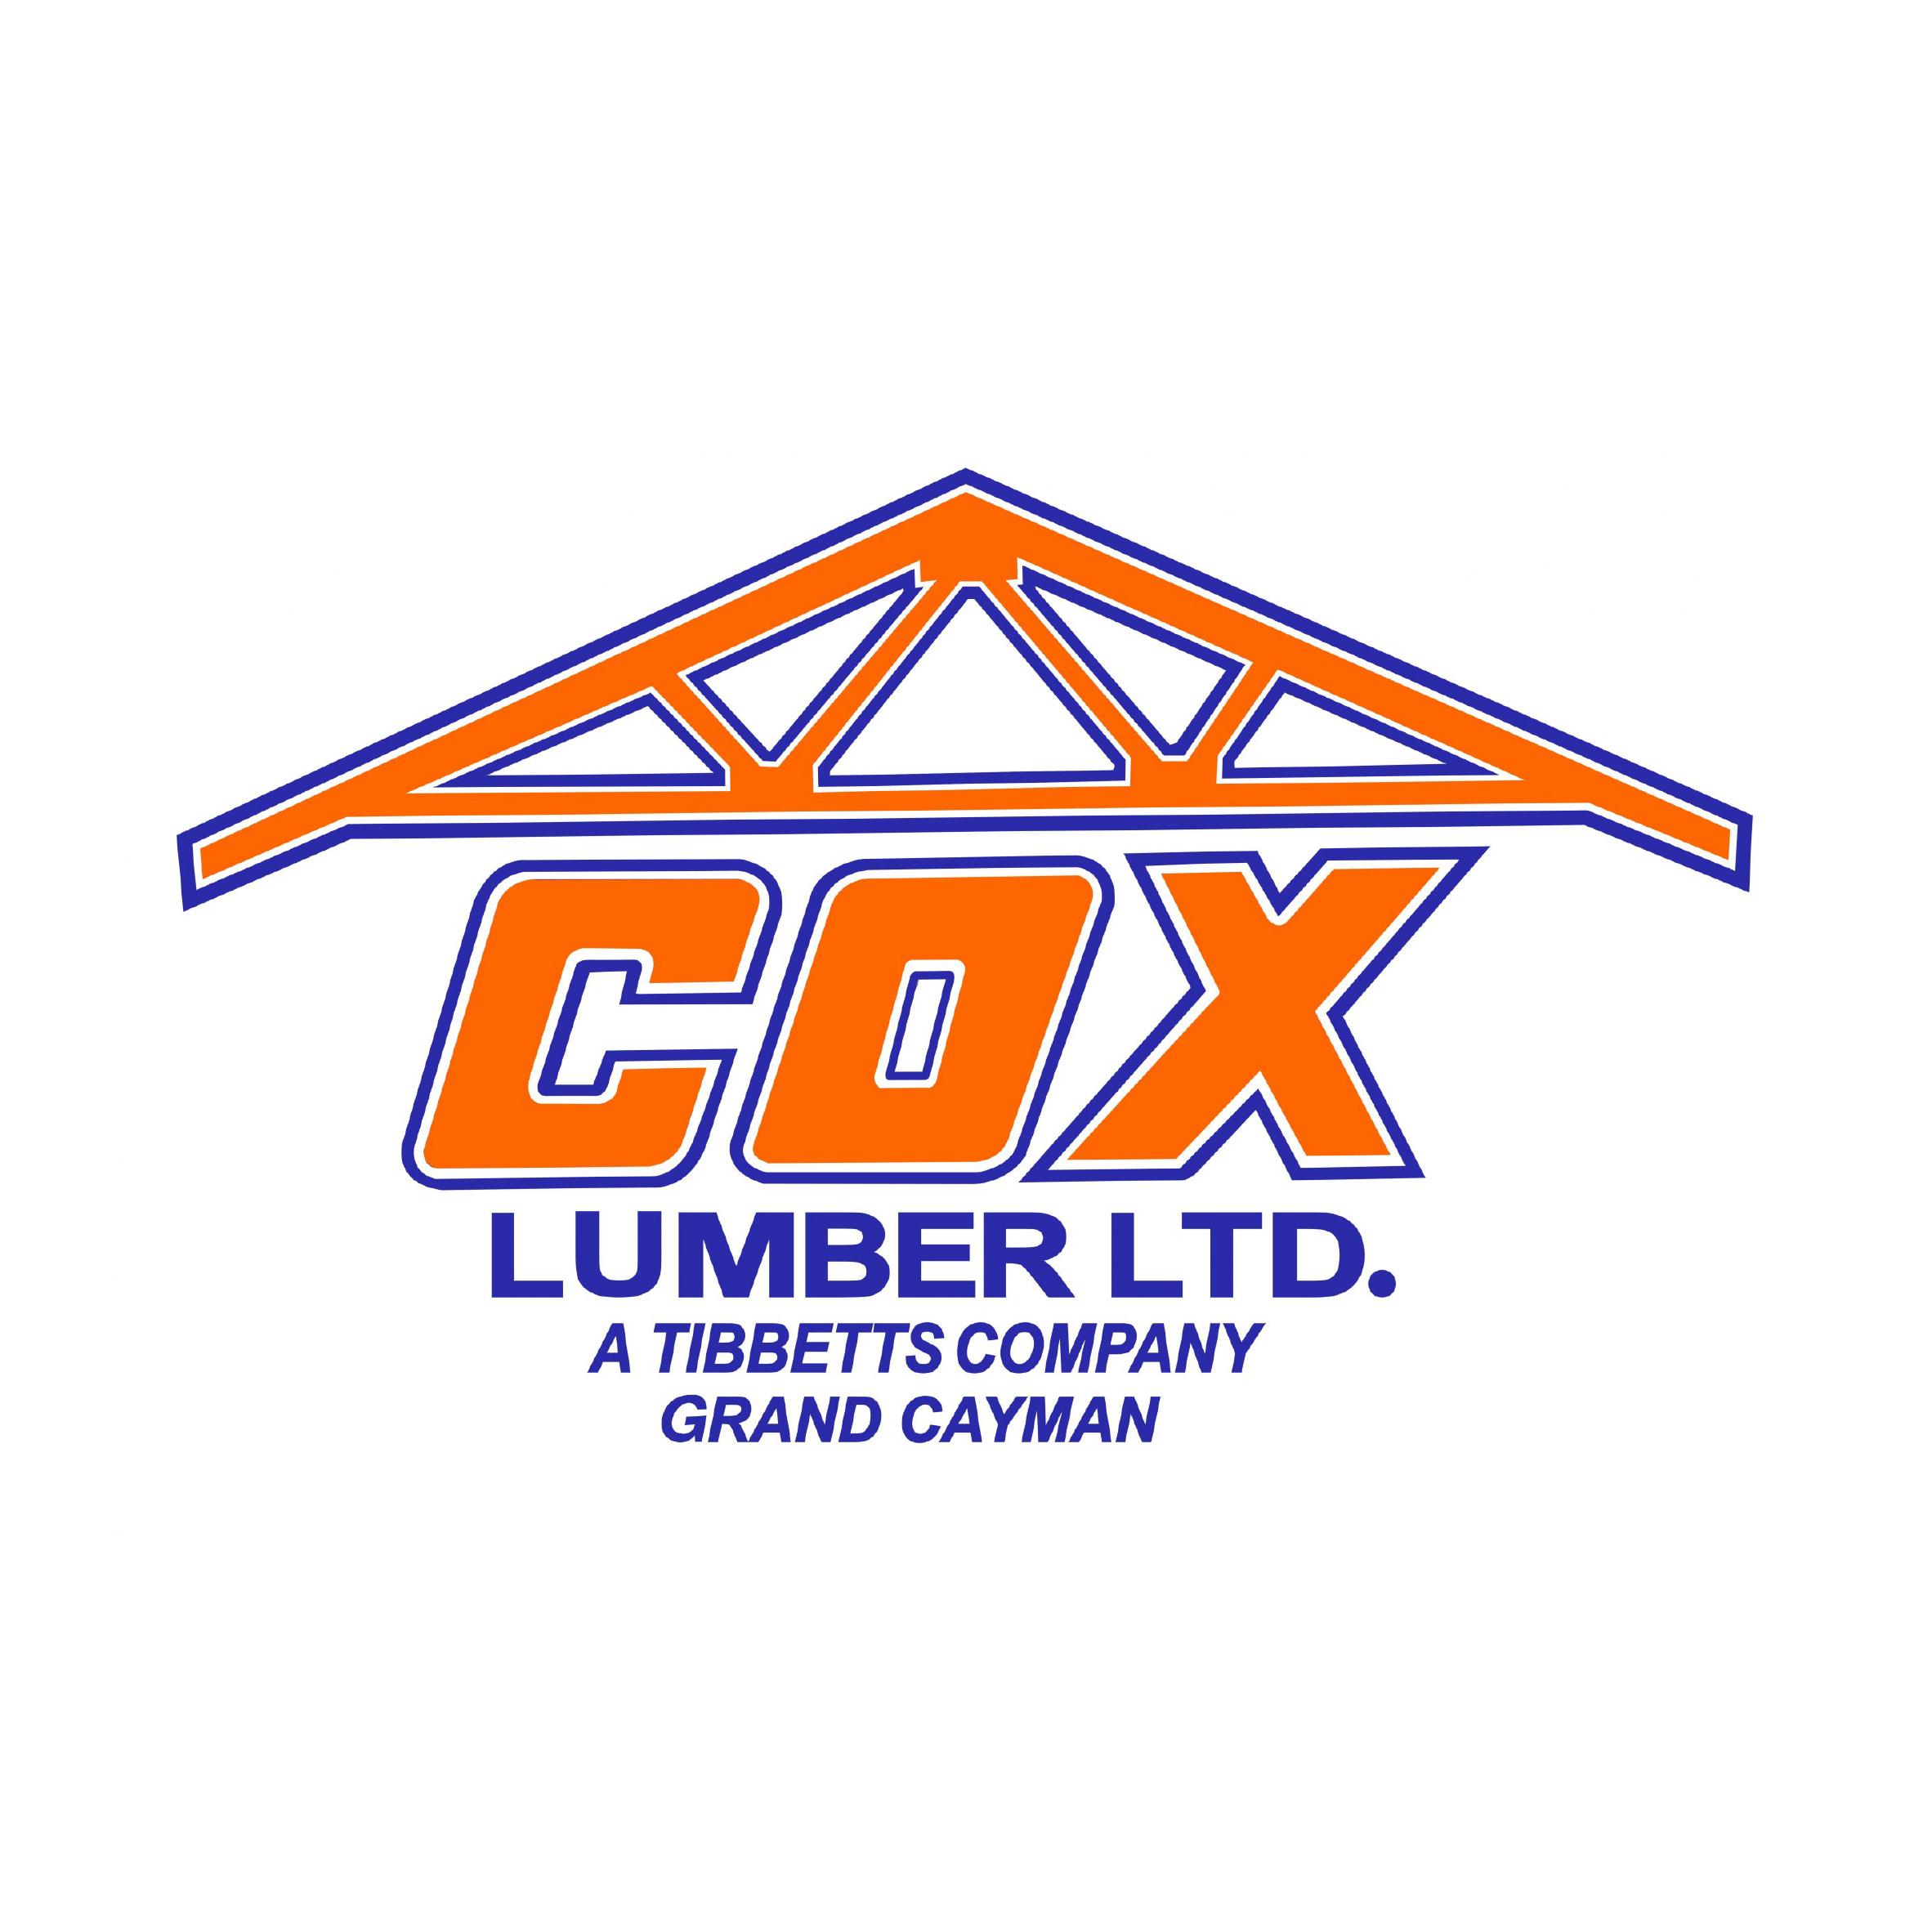 Cox Lumber LTD. logo.